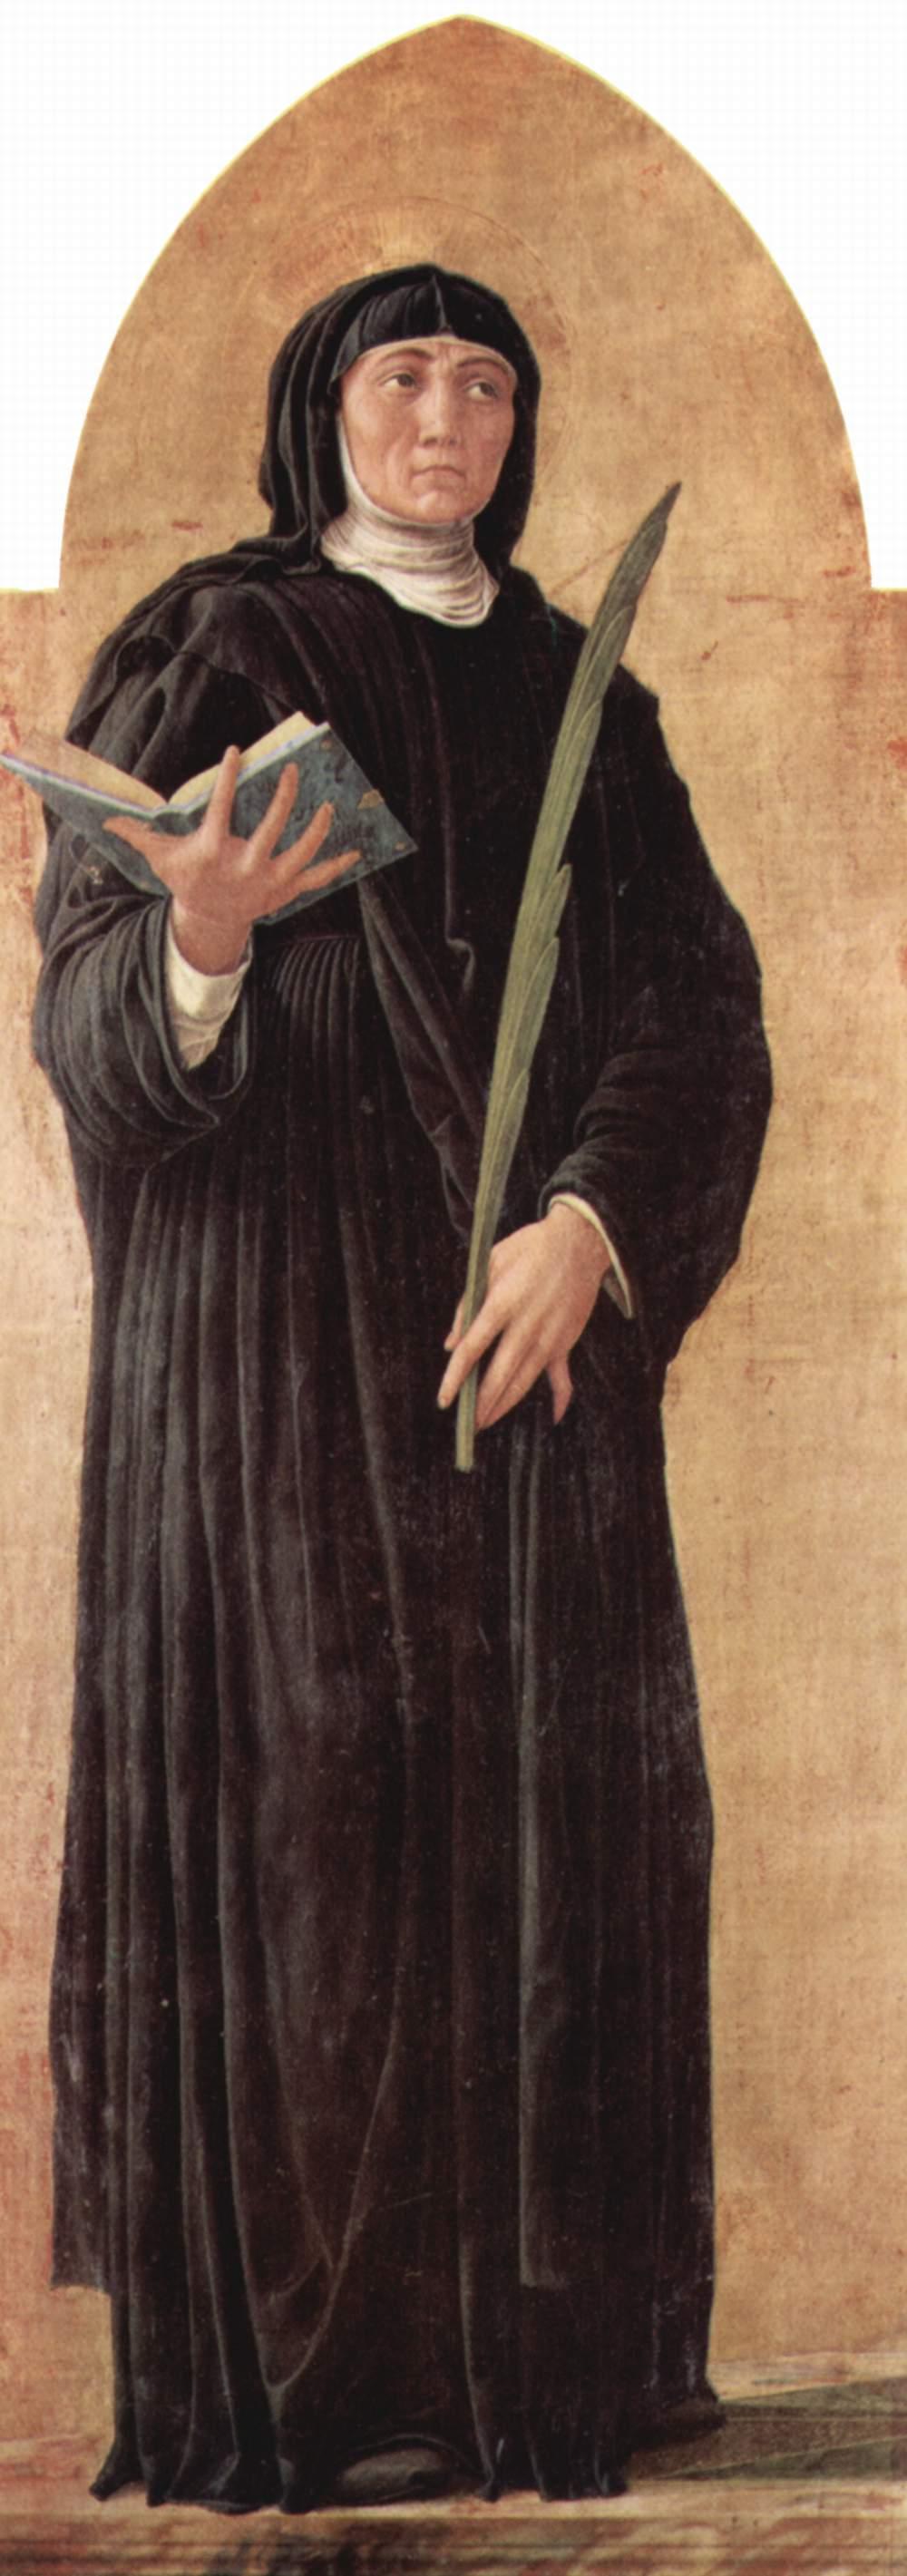 Andrea Mantegna, Die hl. Scholastika, 1453/1454, Pinacoteca di Brera, Mailand